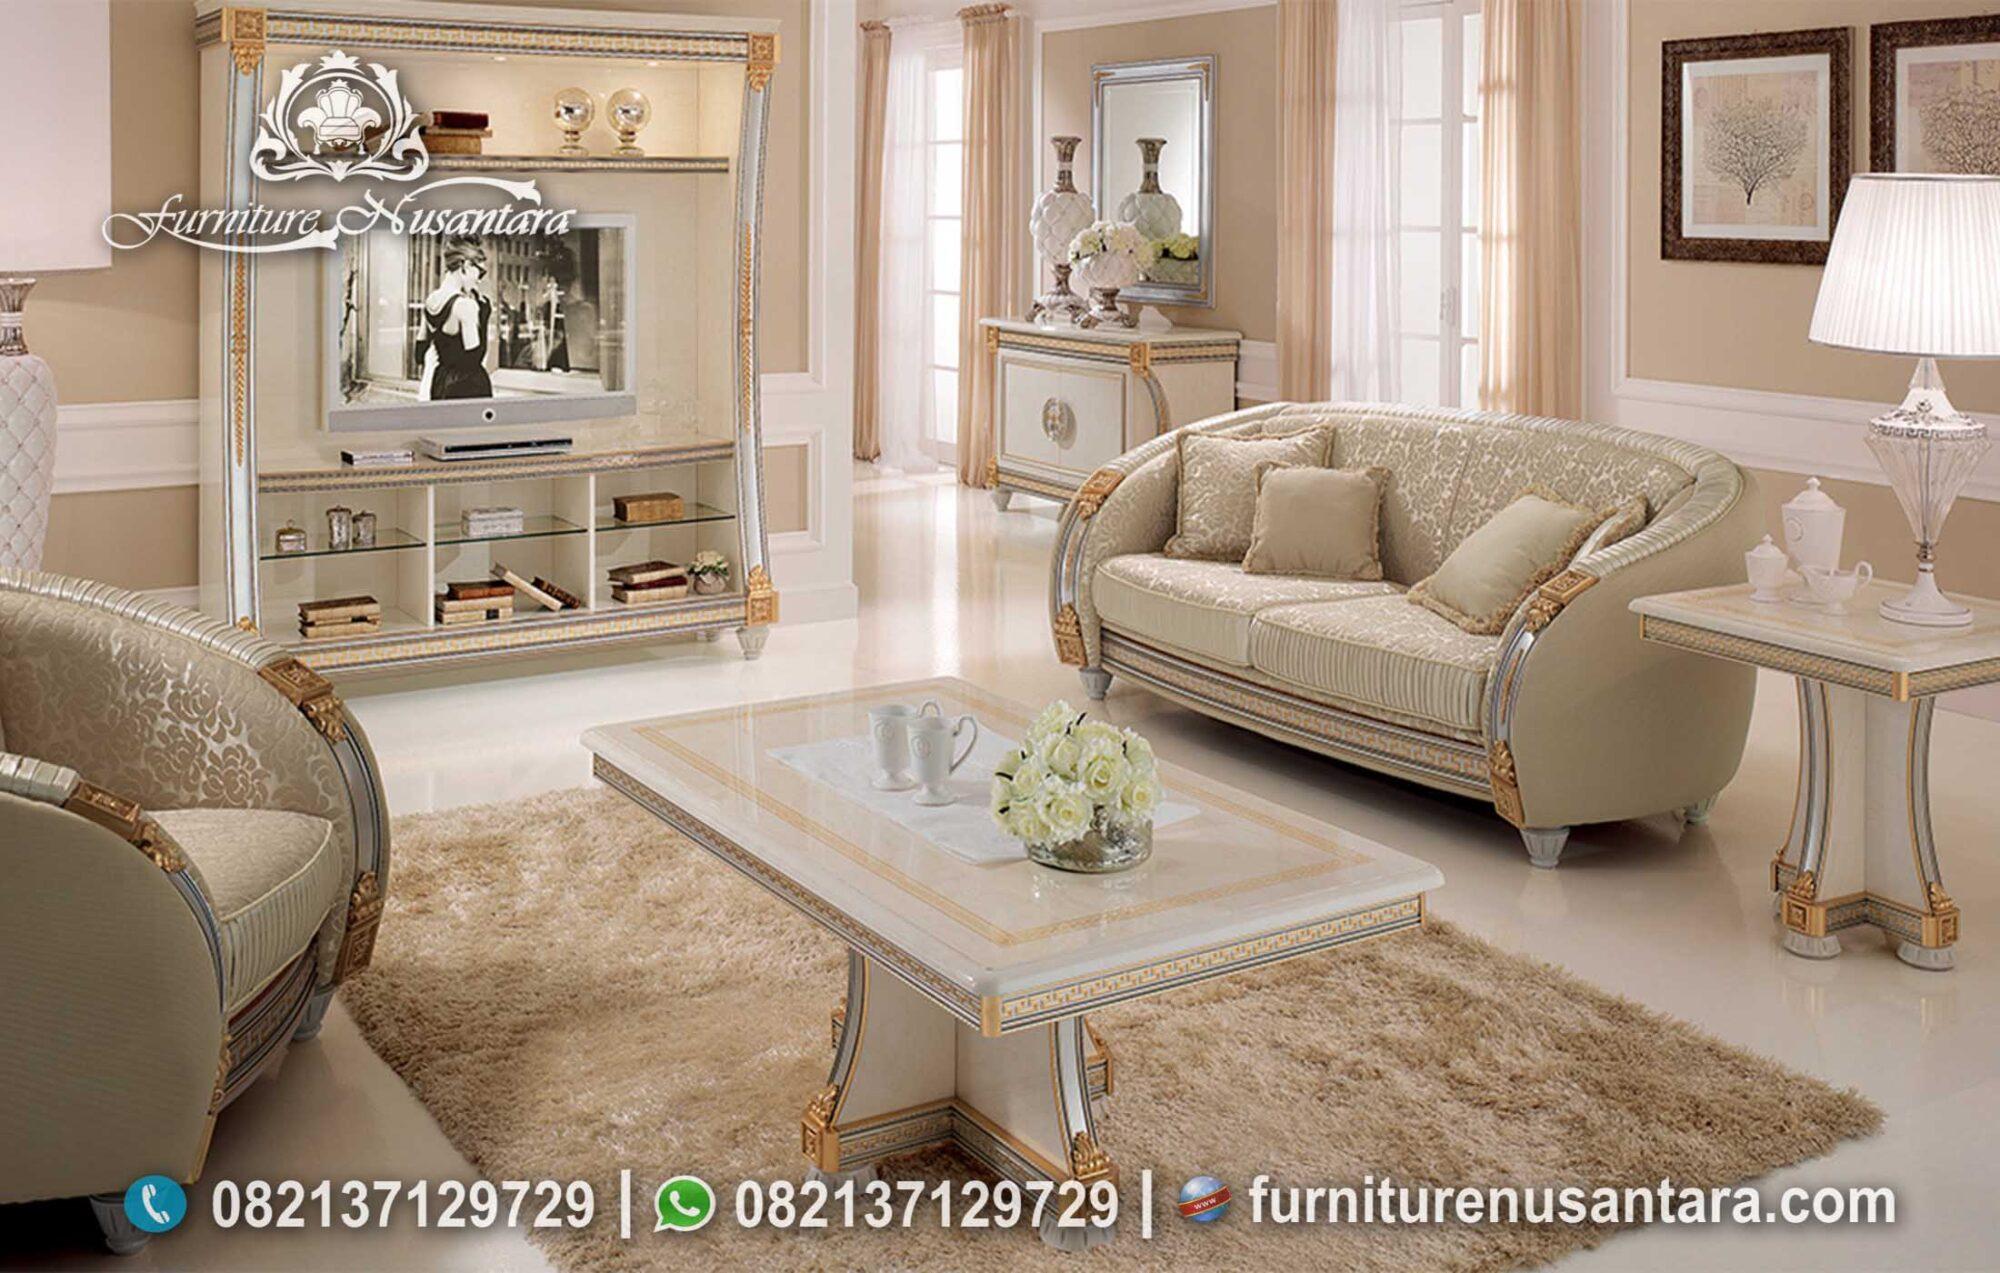 Jual Sofa Klasik Liberty Ruang Keluarga ST-129